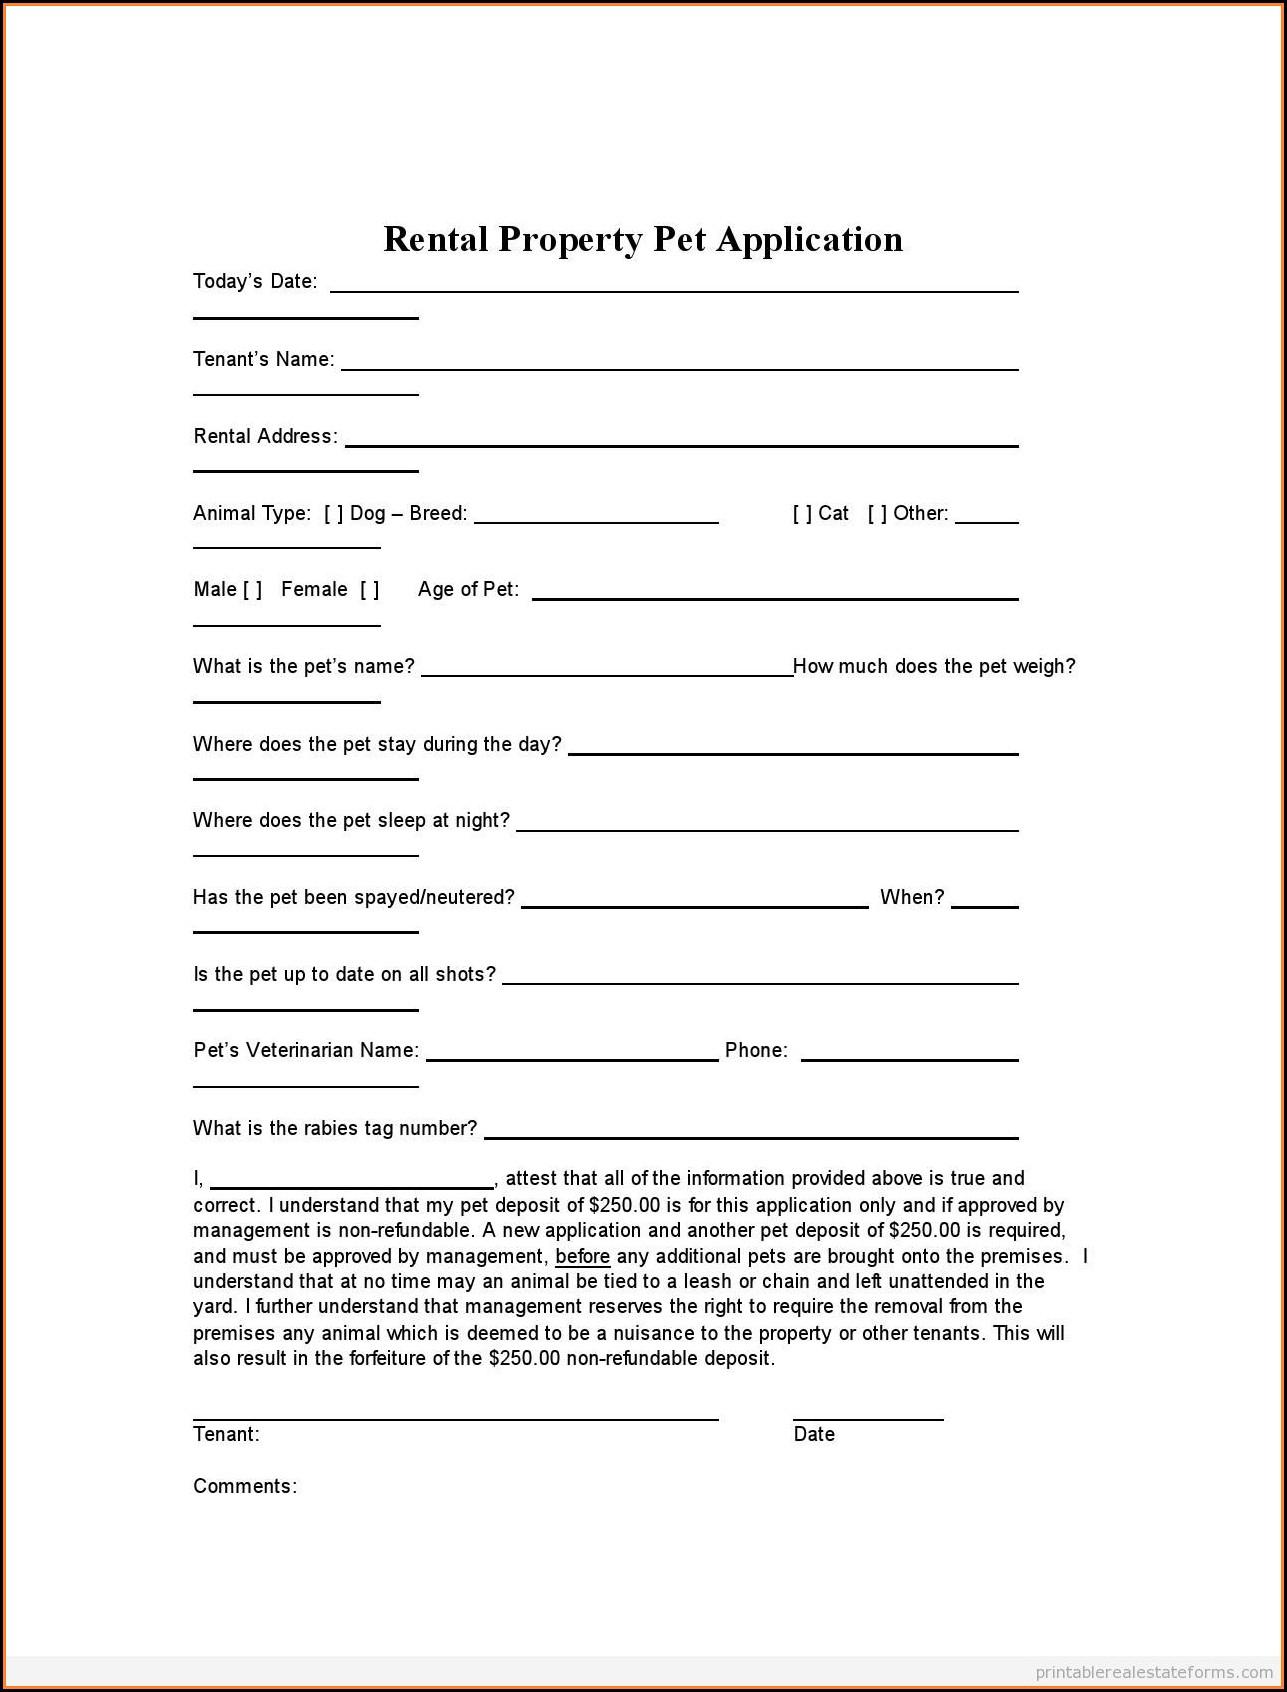 Rental Application Forms Free Printable